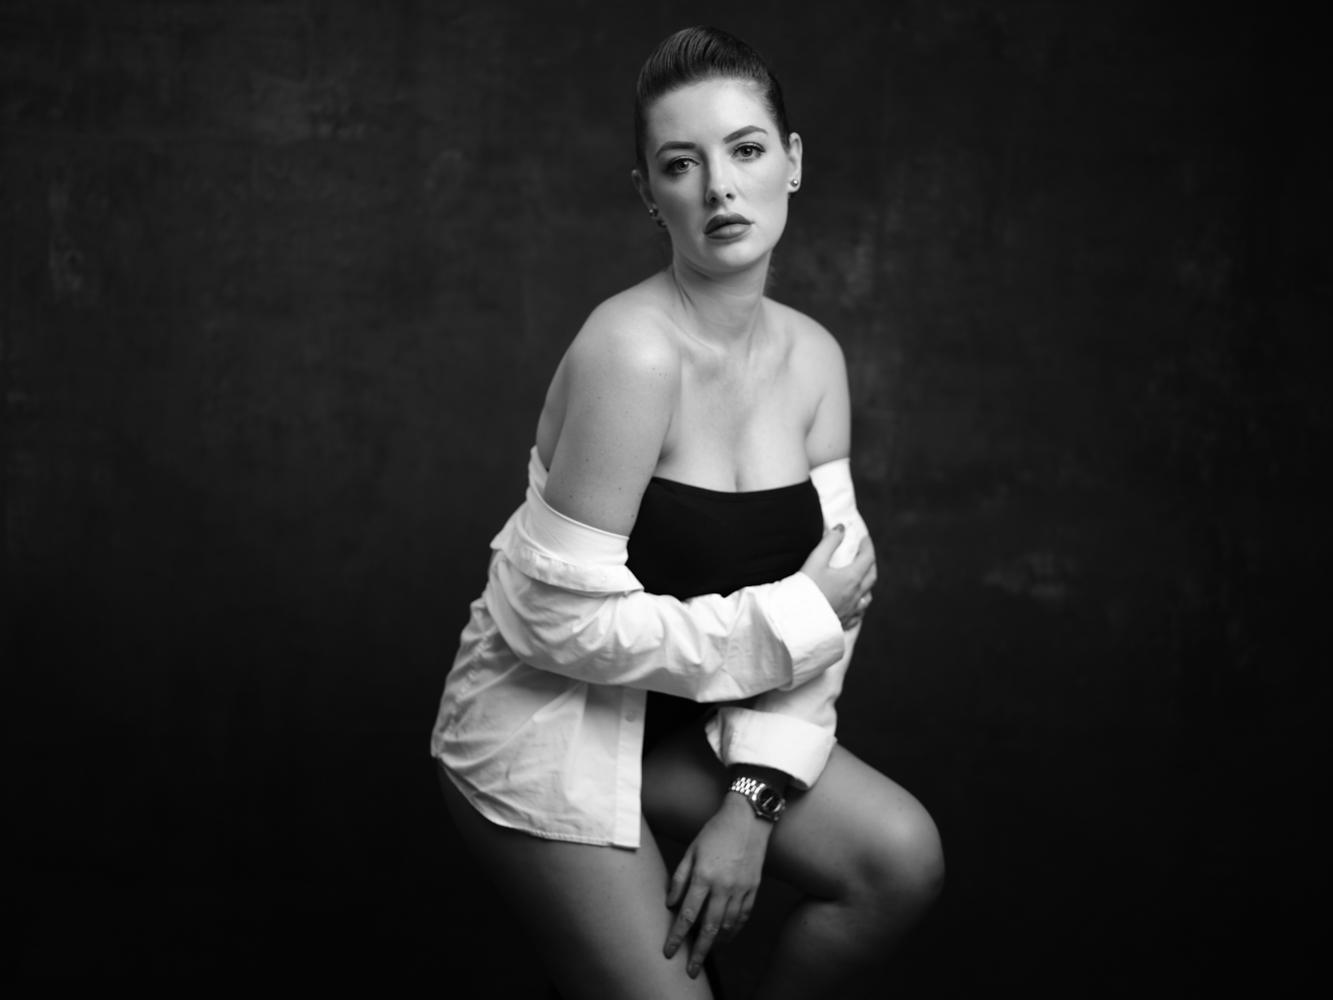 Jemma fashion portrait photography singapore coco creative studio-3